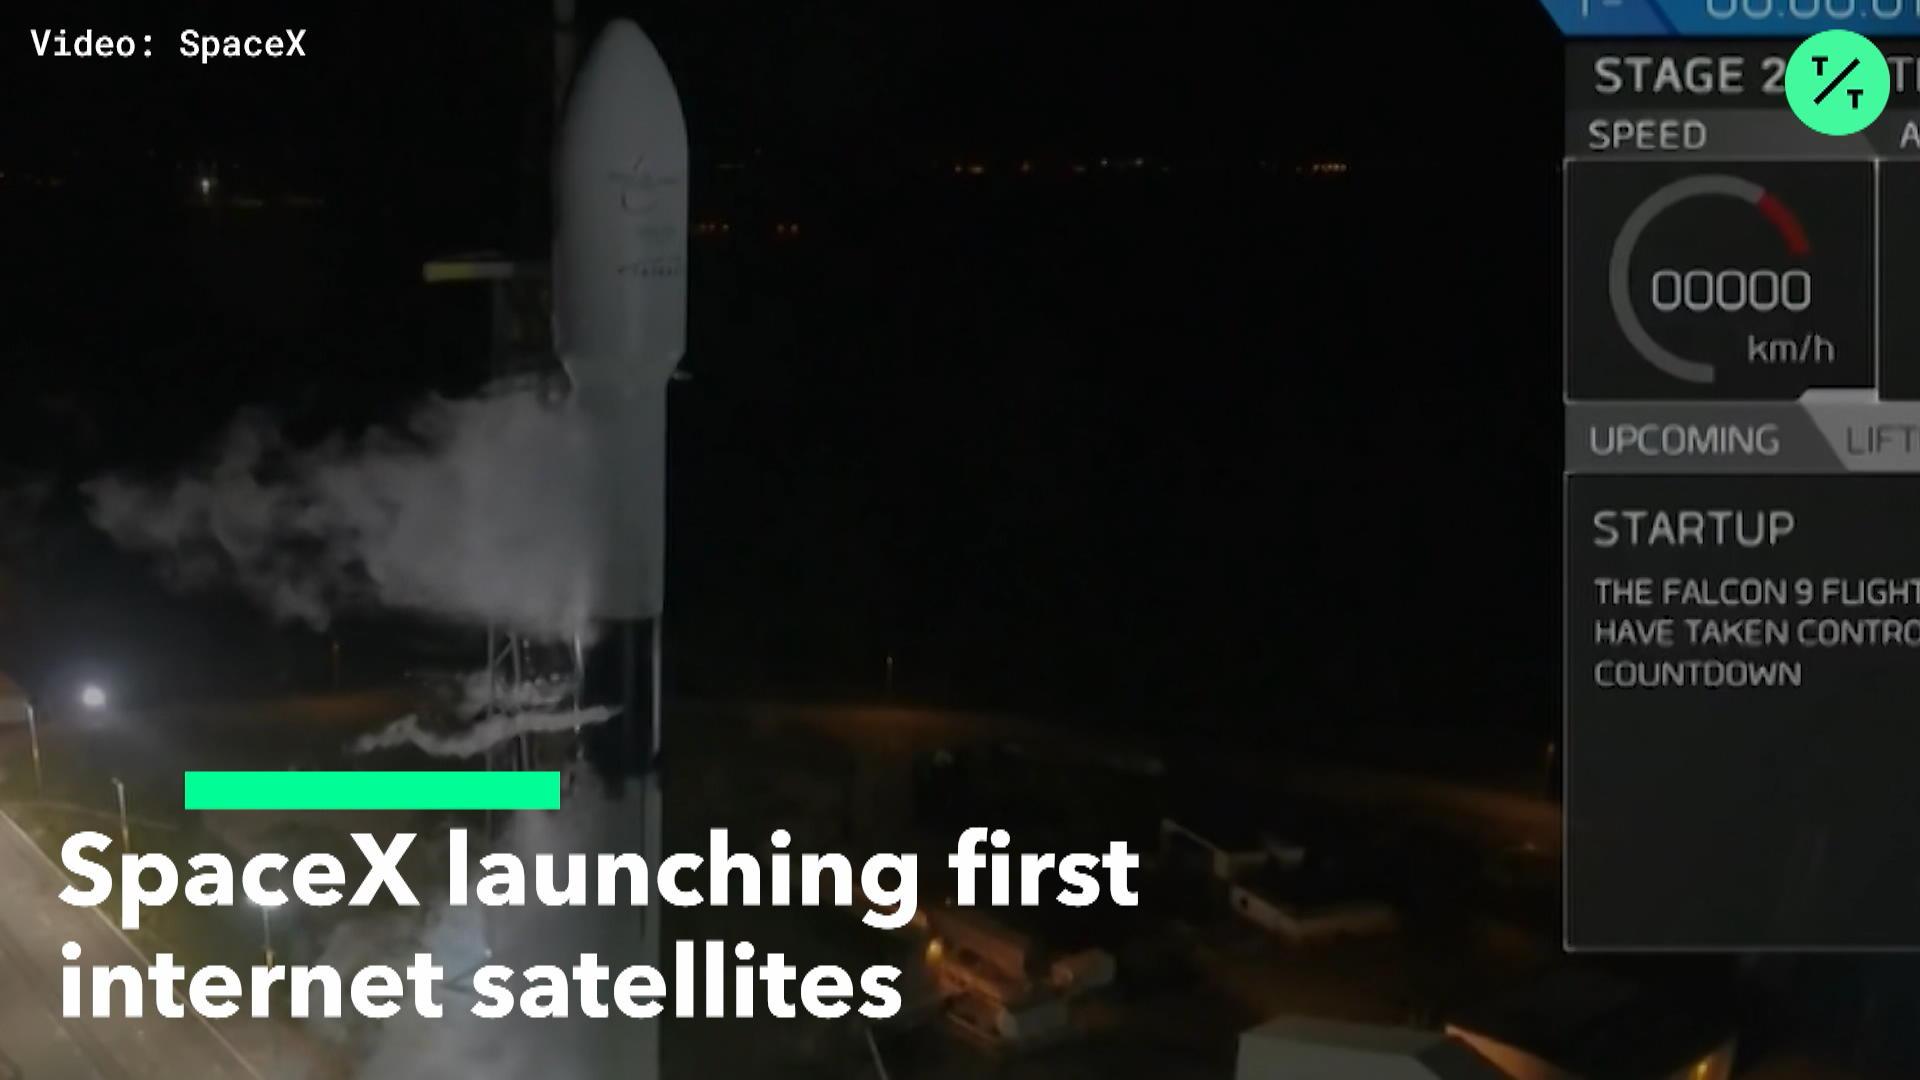 SpaceX Launching Internet Satellites - Bloomberg